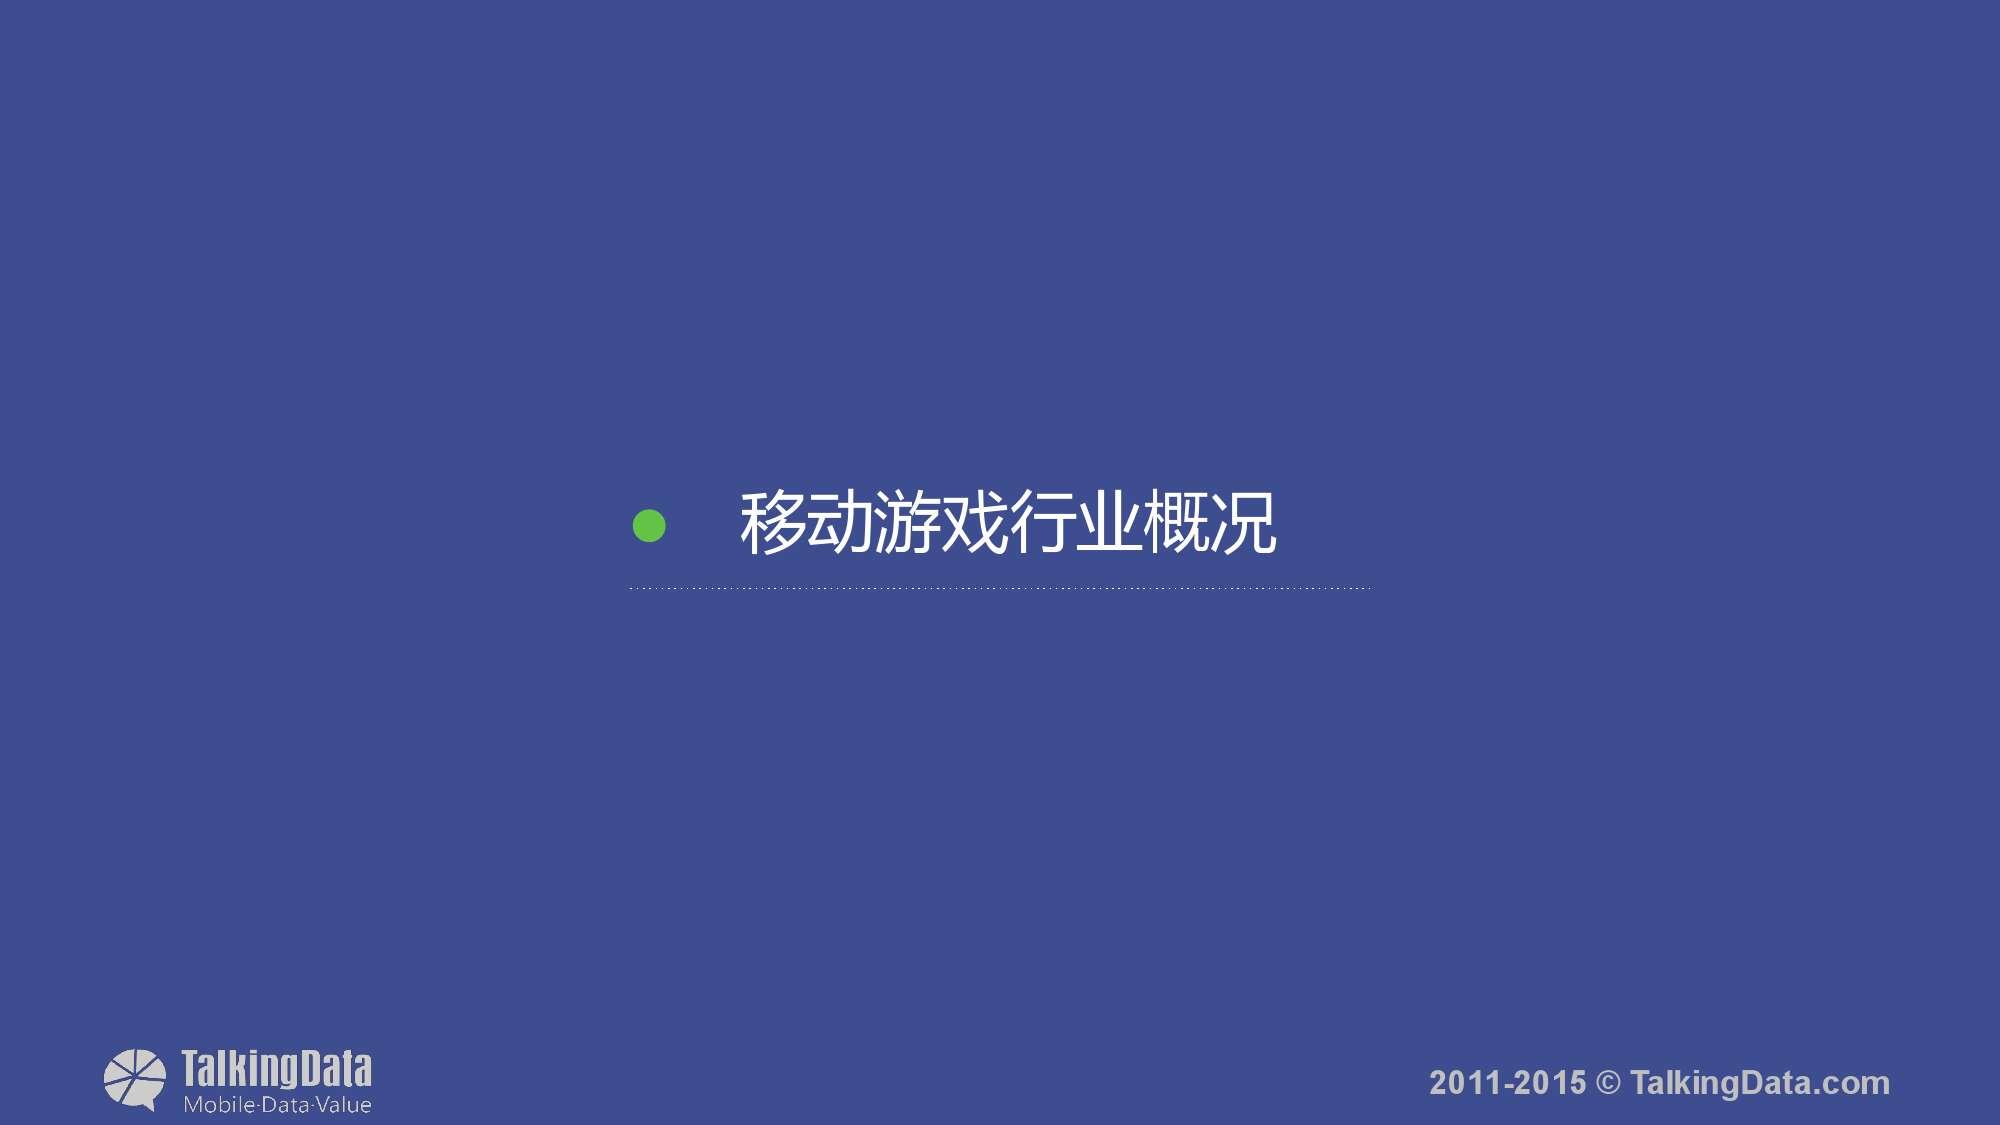 TalkingData-2015年移动游戏行业报告_000003